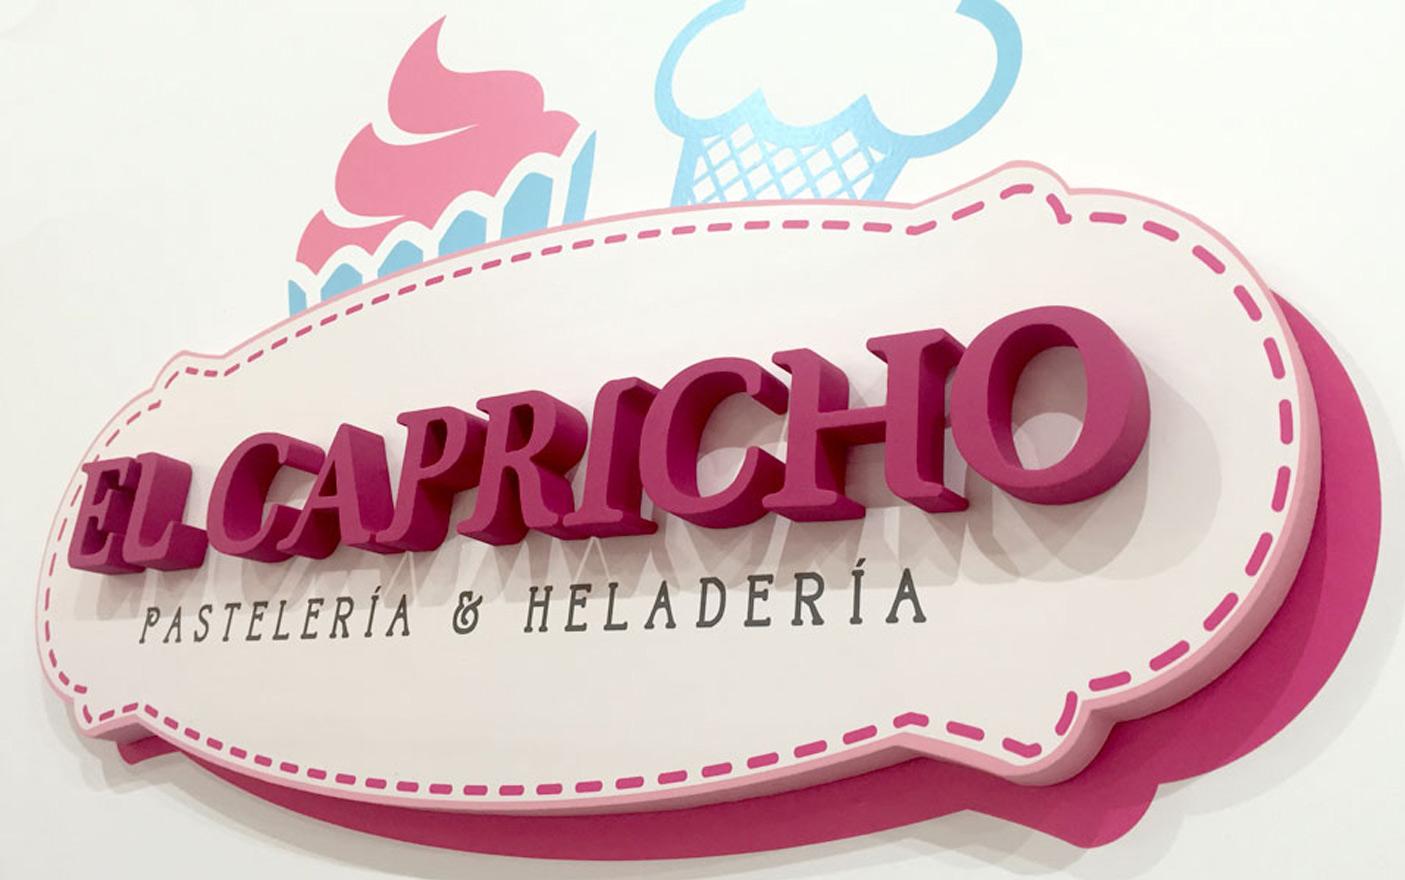 elcapricho-2.jpg